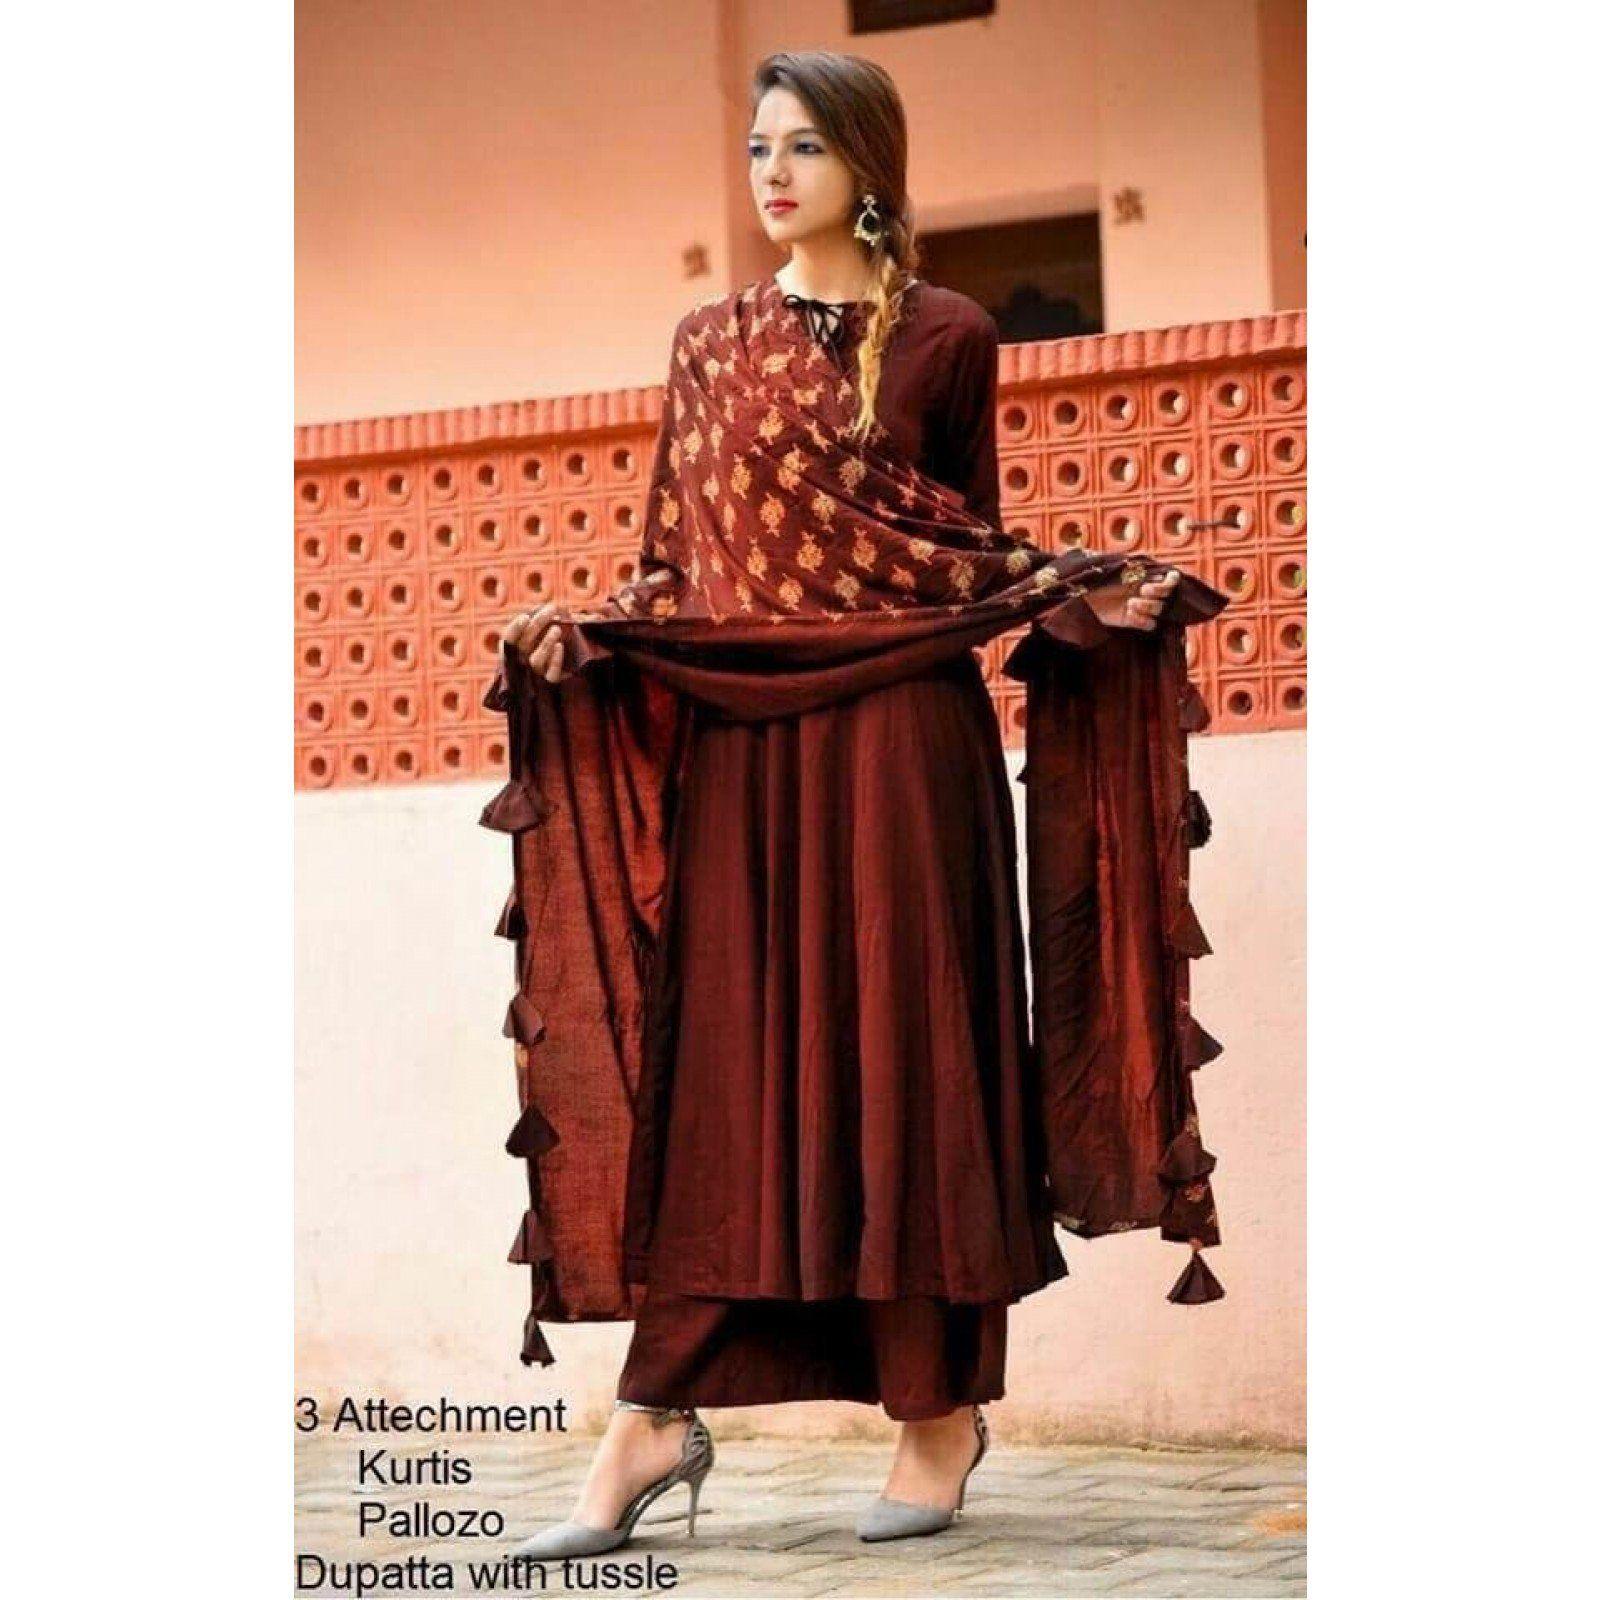 e774d84b6b New maroon color rayon heavy palazzo suit with dupatta. #Palazzosuit  #Designerpalazzosuit #Partywearpalazzosuit #Palazzodress #Zipker